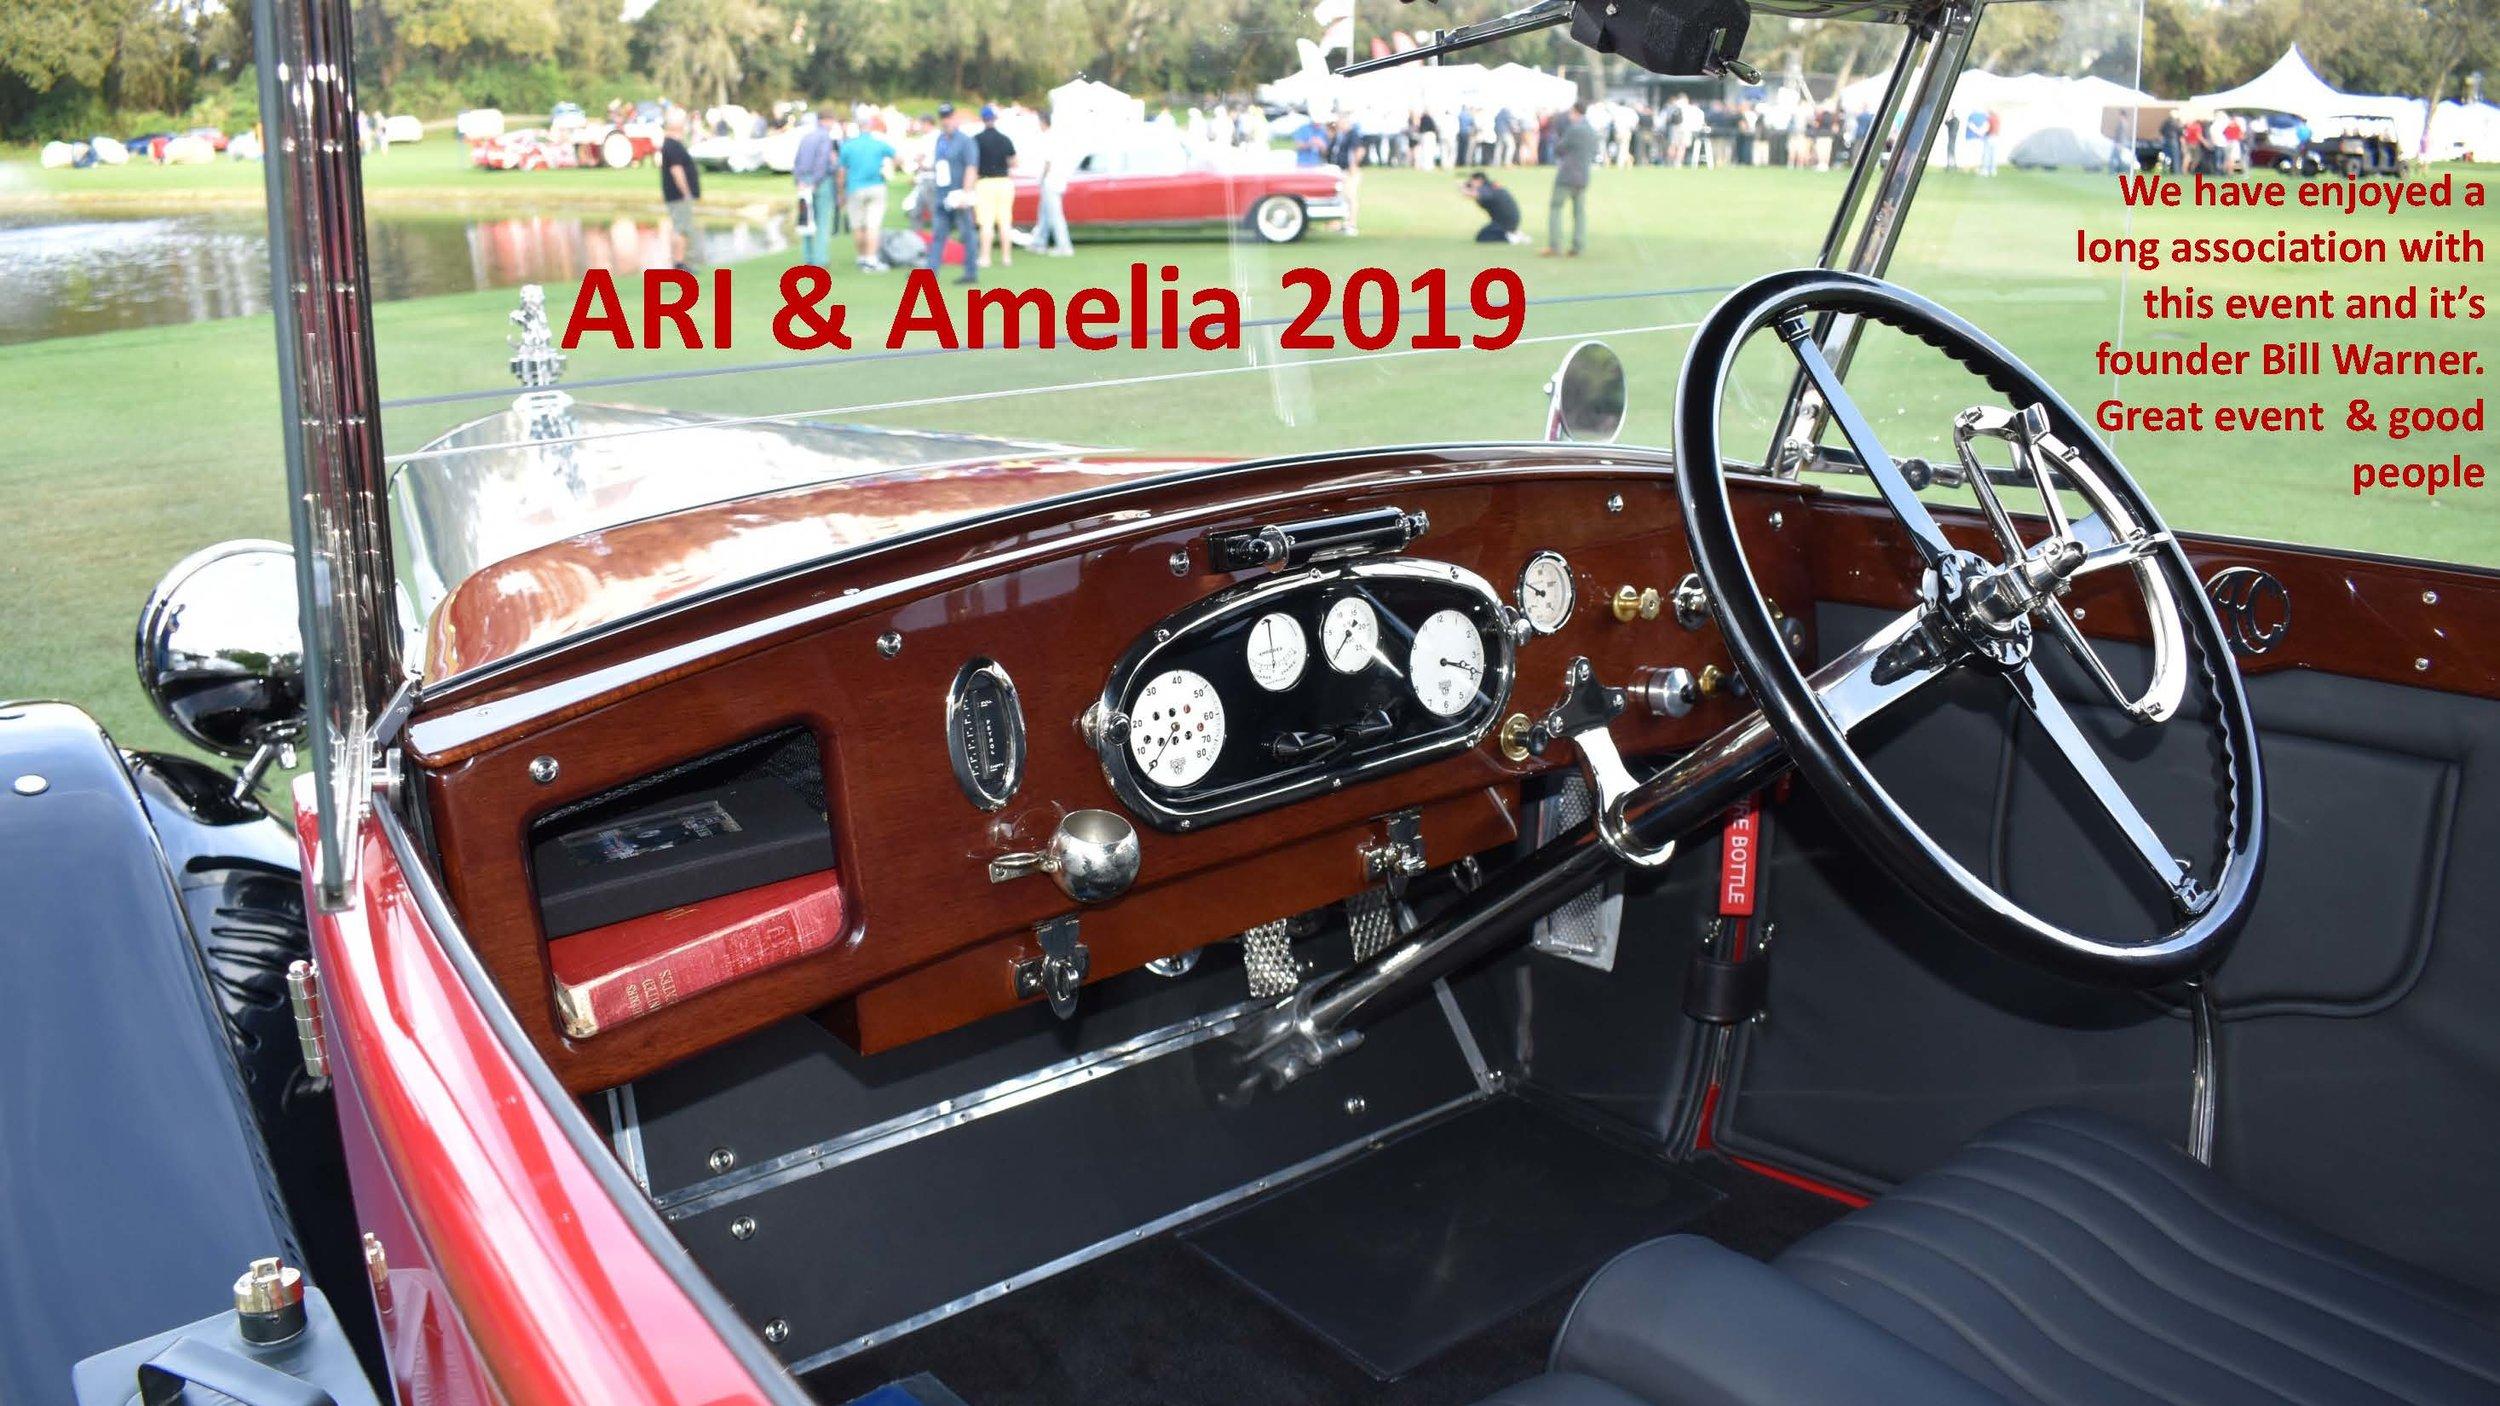 Amelia 2019 fnl_Page_1.jpg